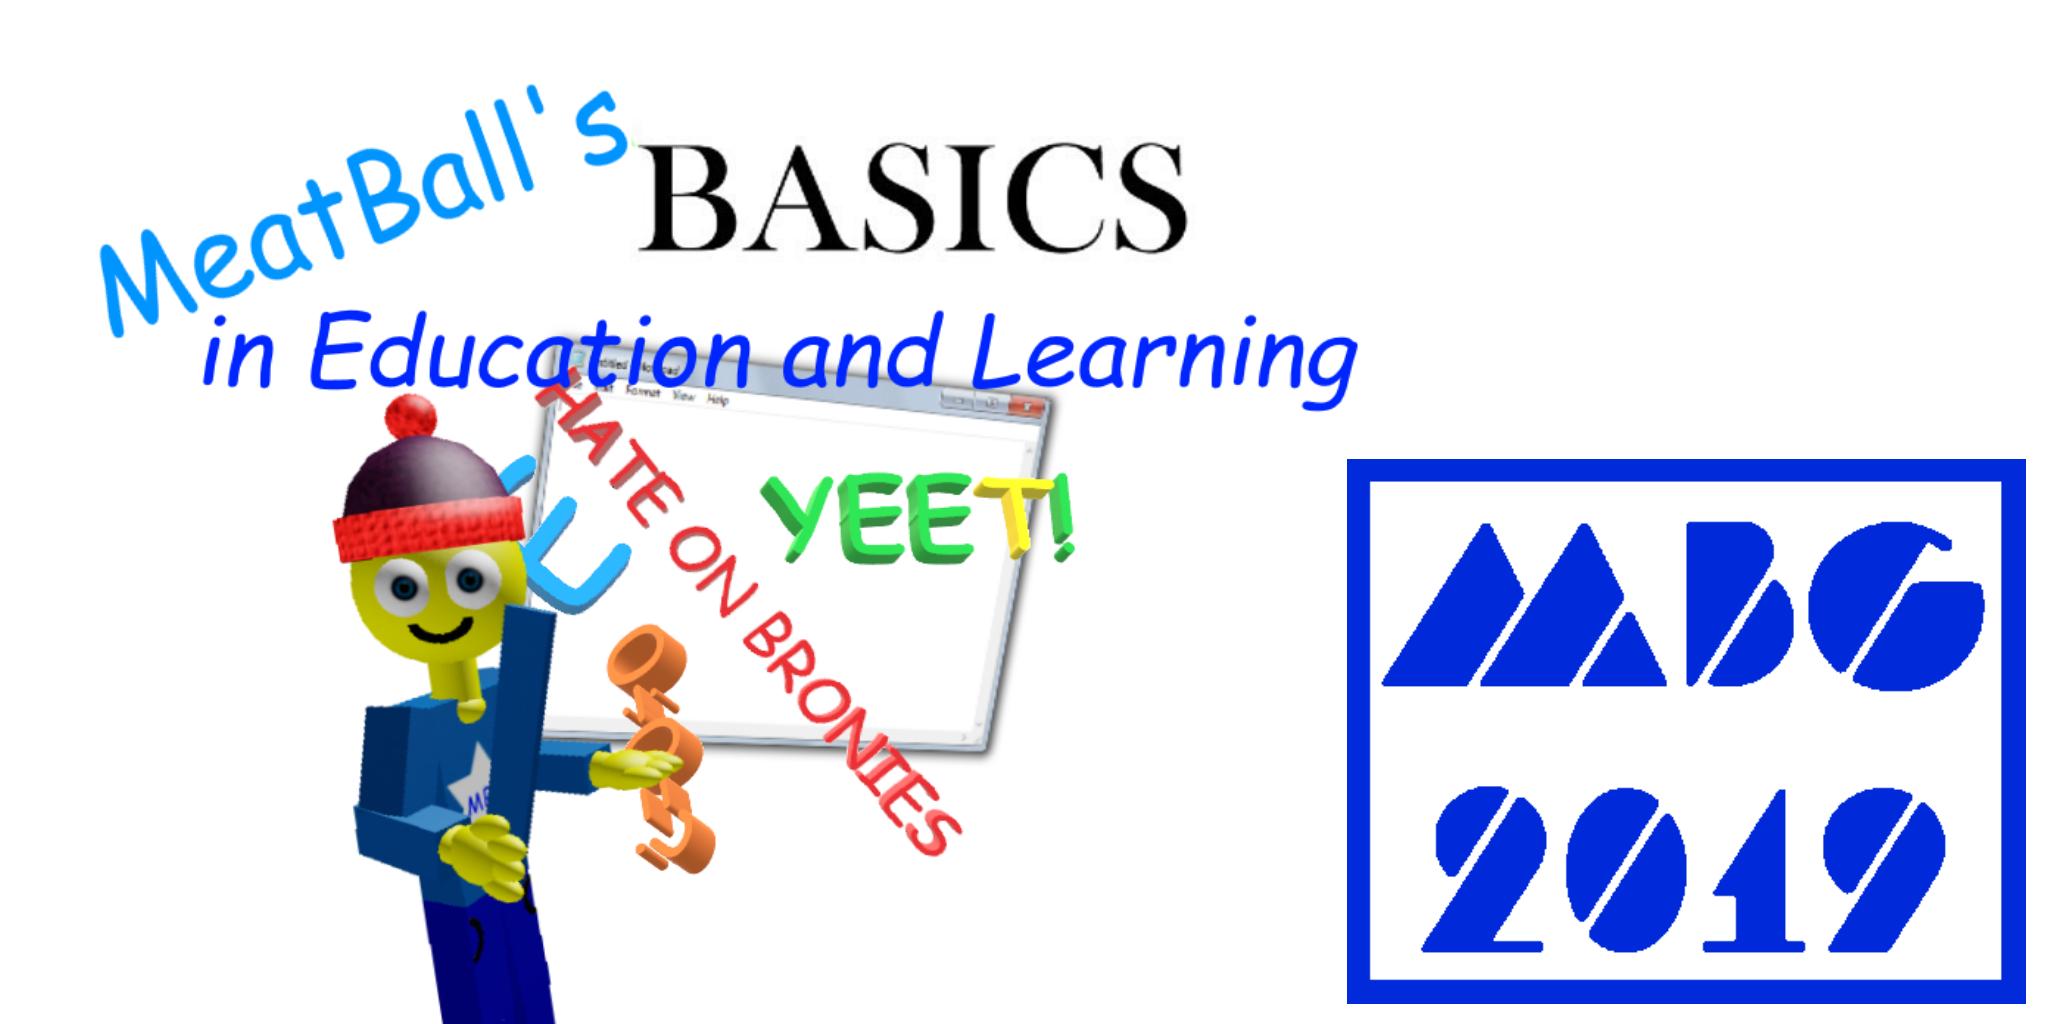 MeatBall's Basics (Baldi's Basics 1.4 mod)